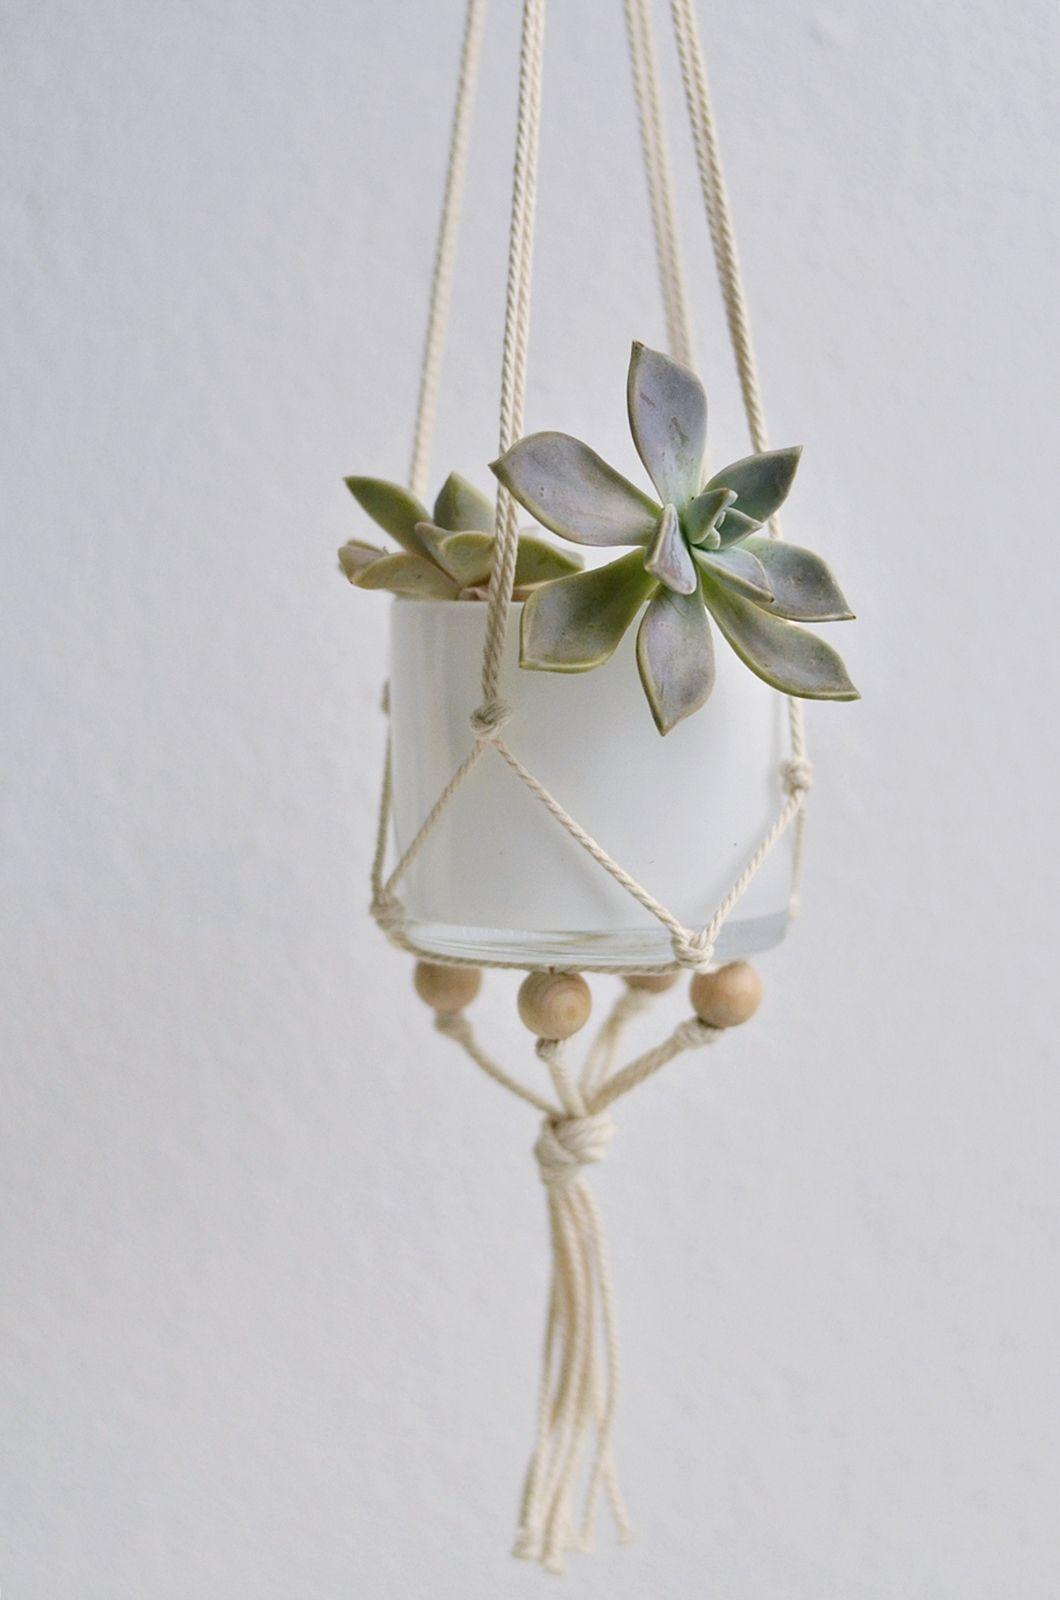 nachmachtipp makramee h ngeampel diy hanging planter planters and plants. Black Bedroom Furniture Sets. Home Design Ideas